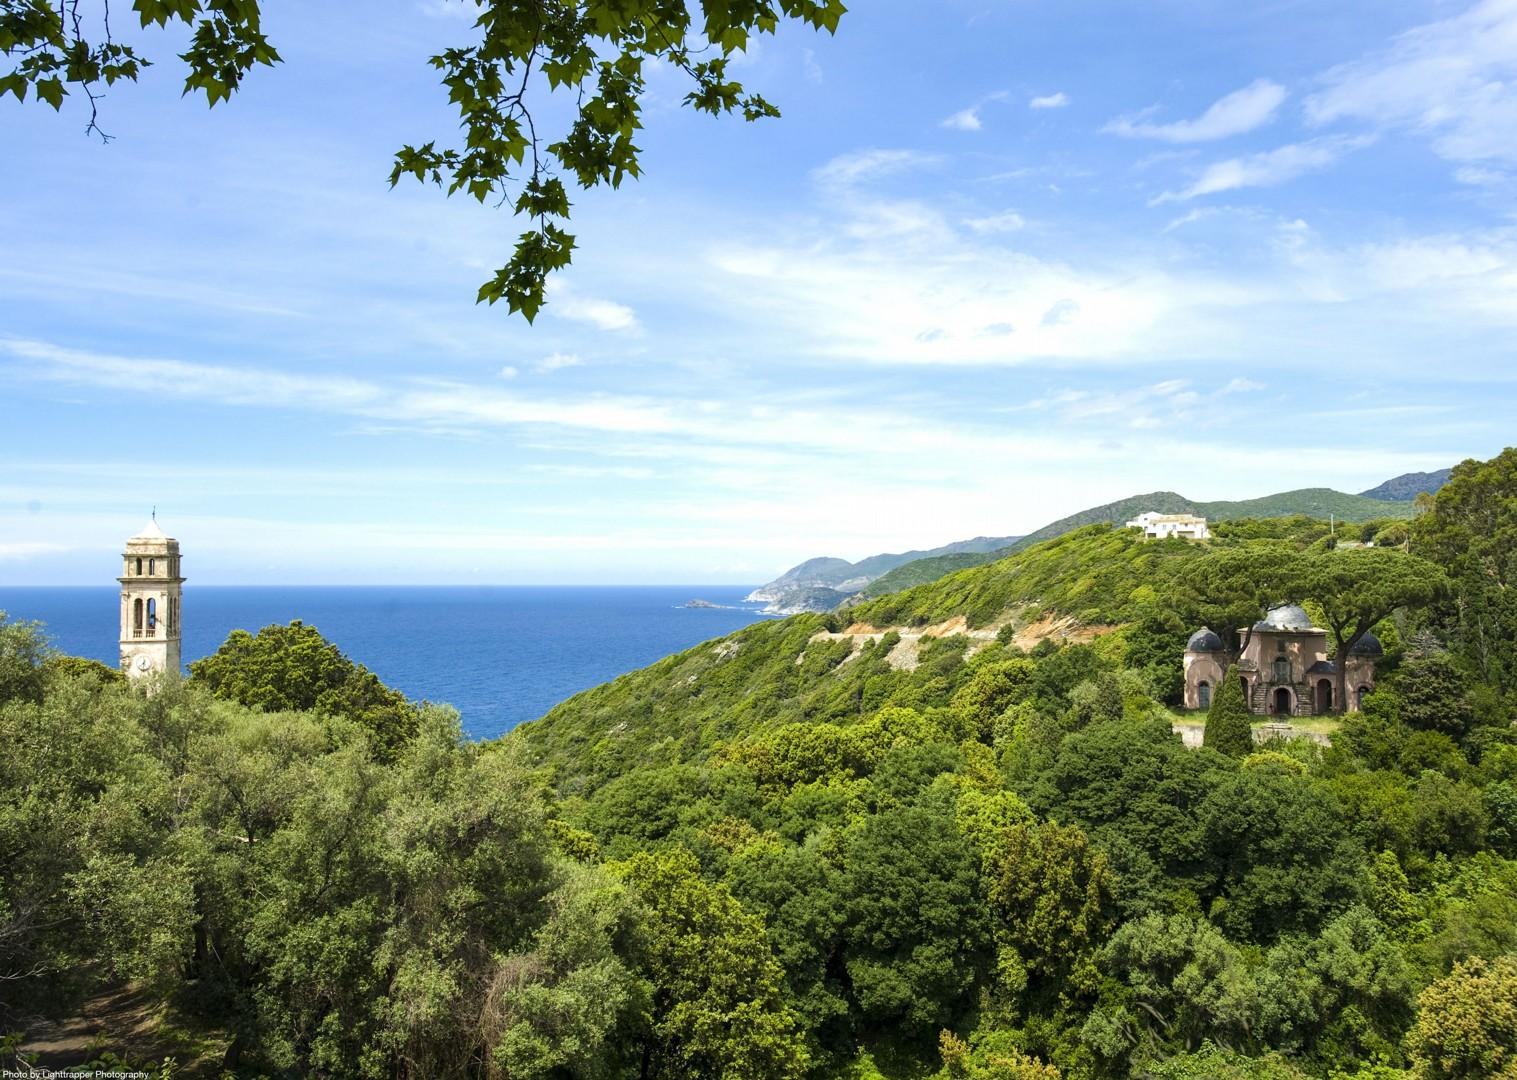 col-de-teghim-corsica-europe-france-saddle-skedaddle-cycling-holiday-best.jpg - France - Corsica - Self-Guided Leisure Cycling Holiday - Leisure Cycling